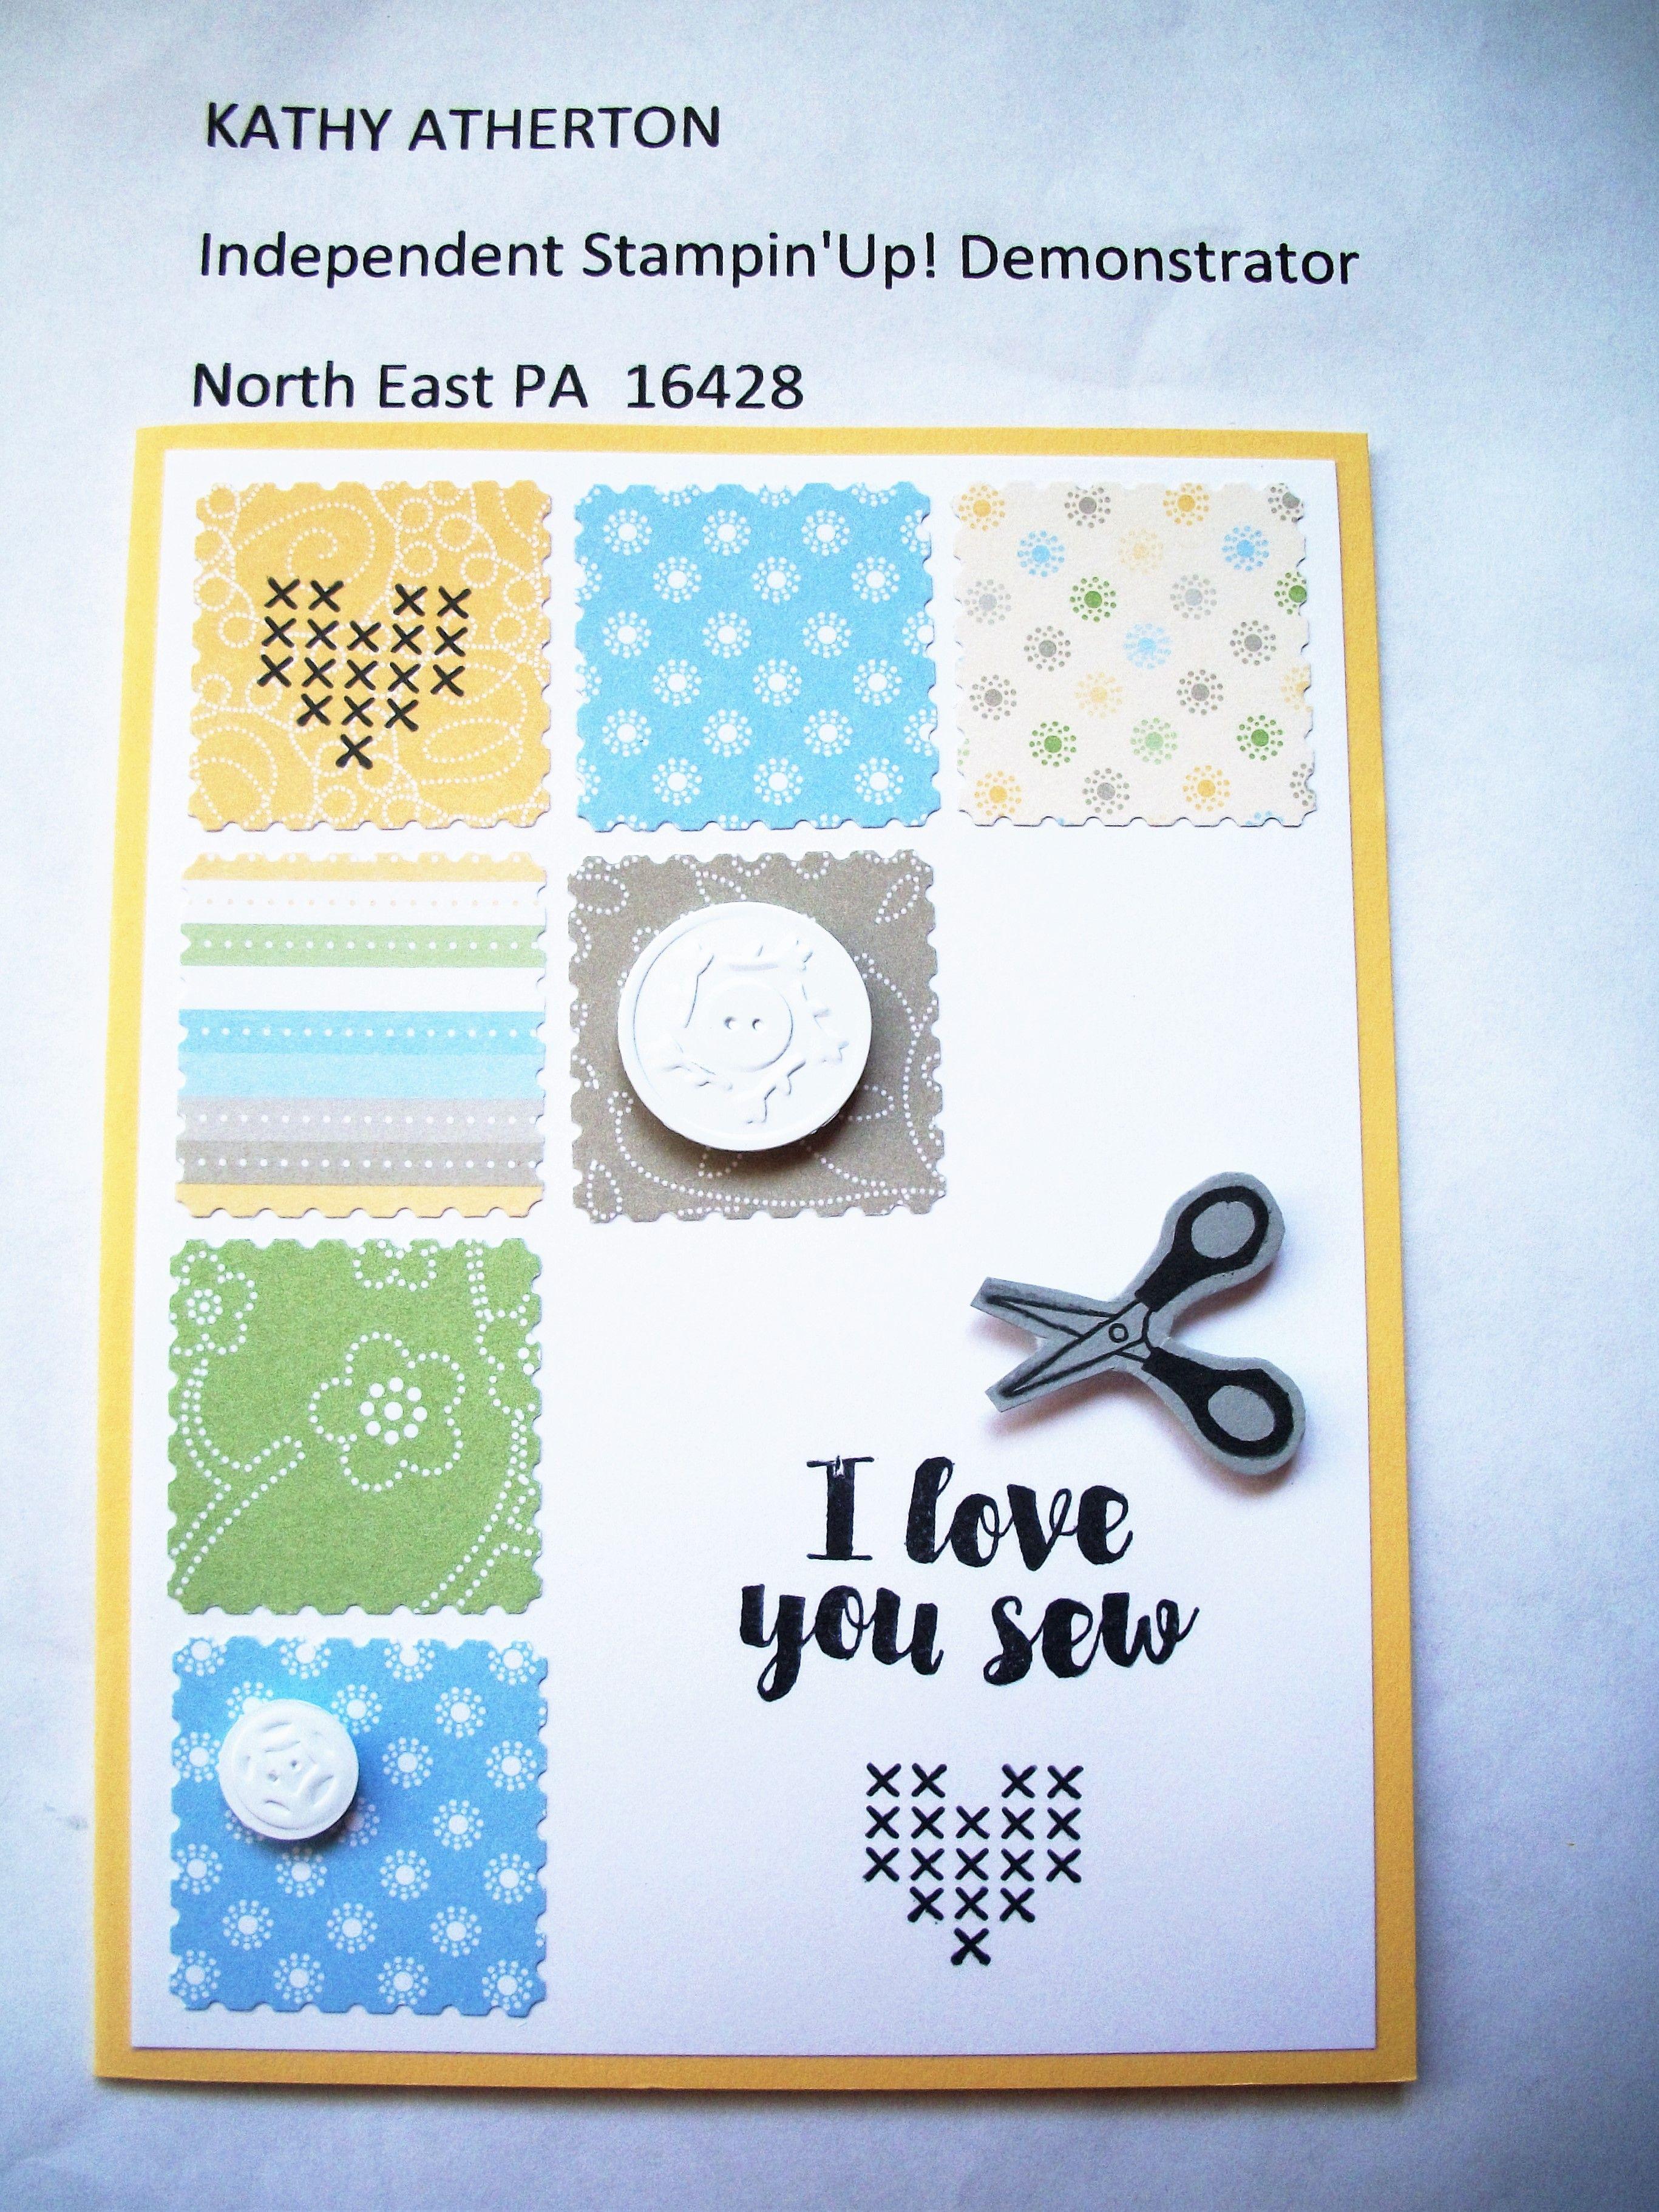 Kathy's April 2016 Stamp Camp Card #4 - SU Hostess set Love You Sew